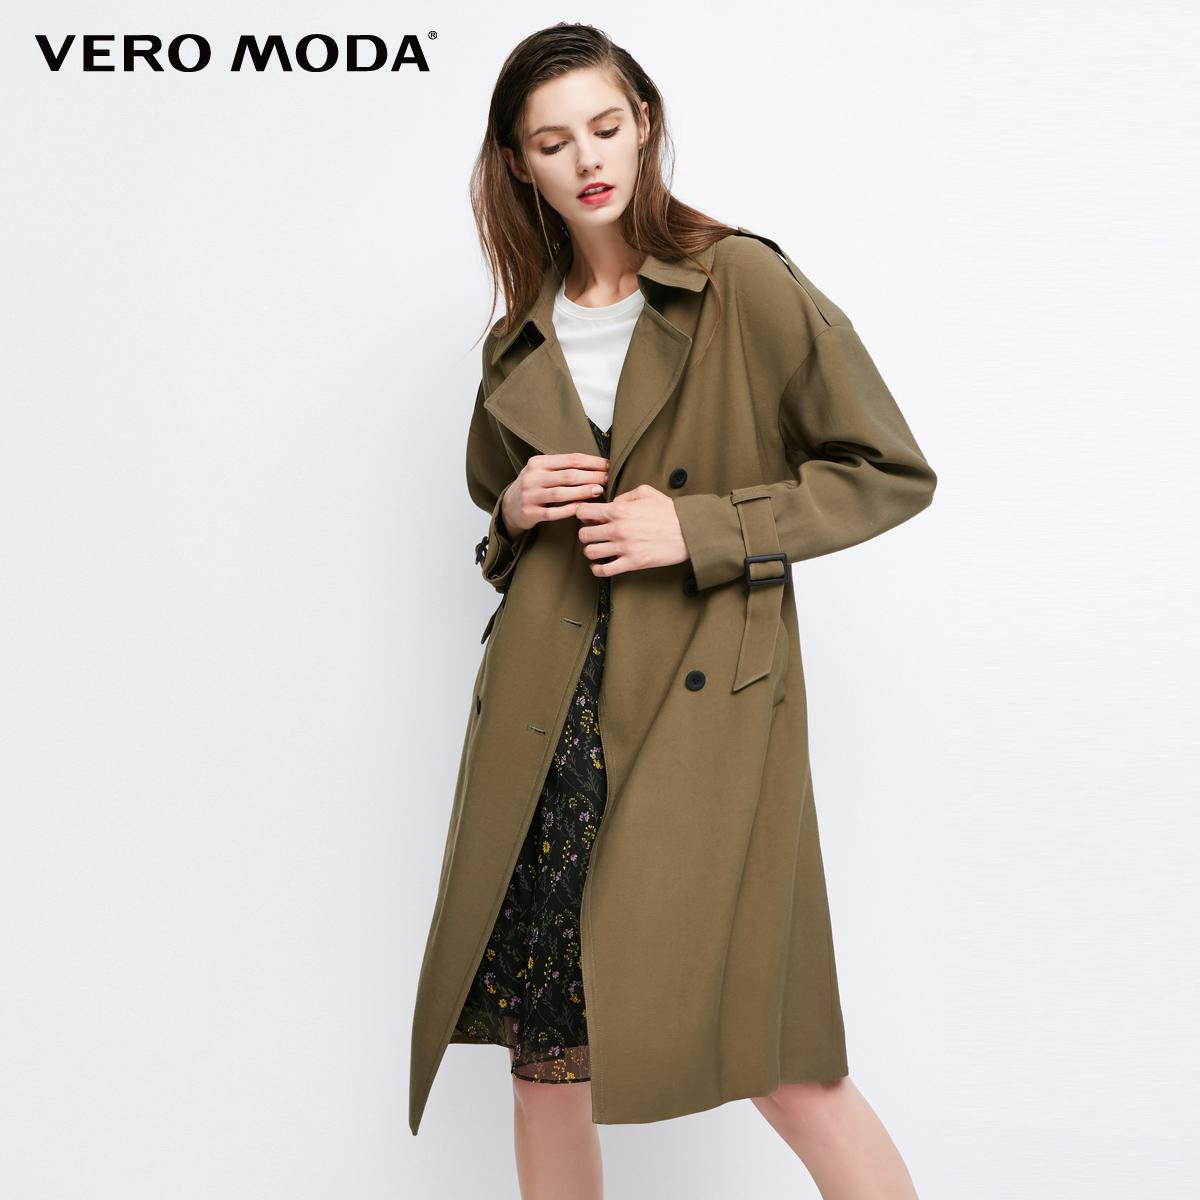 Vero Moda2017秋季新款军装风落肩双排扣中长款风衣|317321509